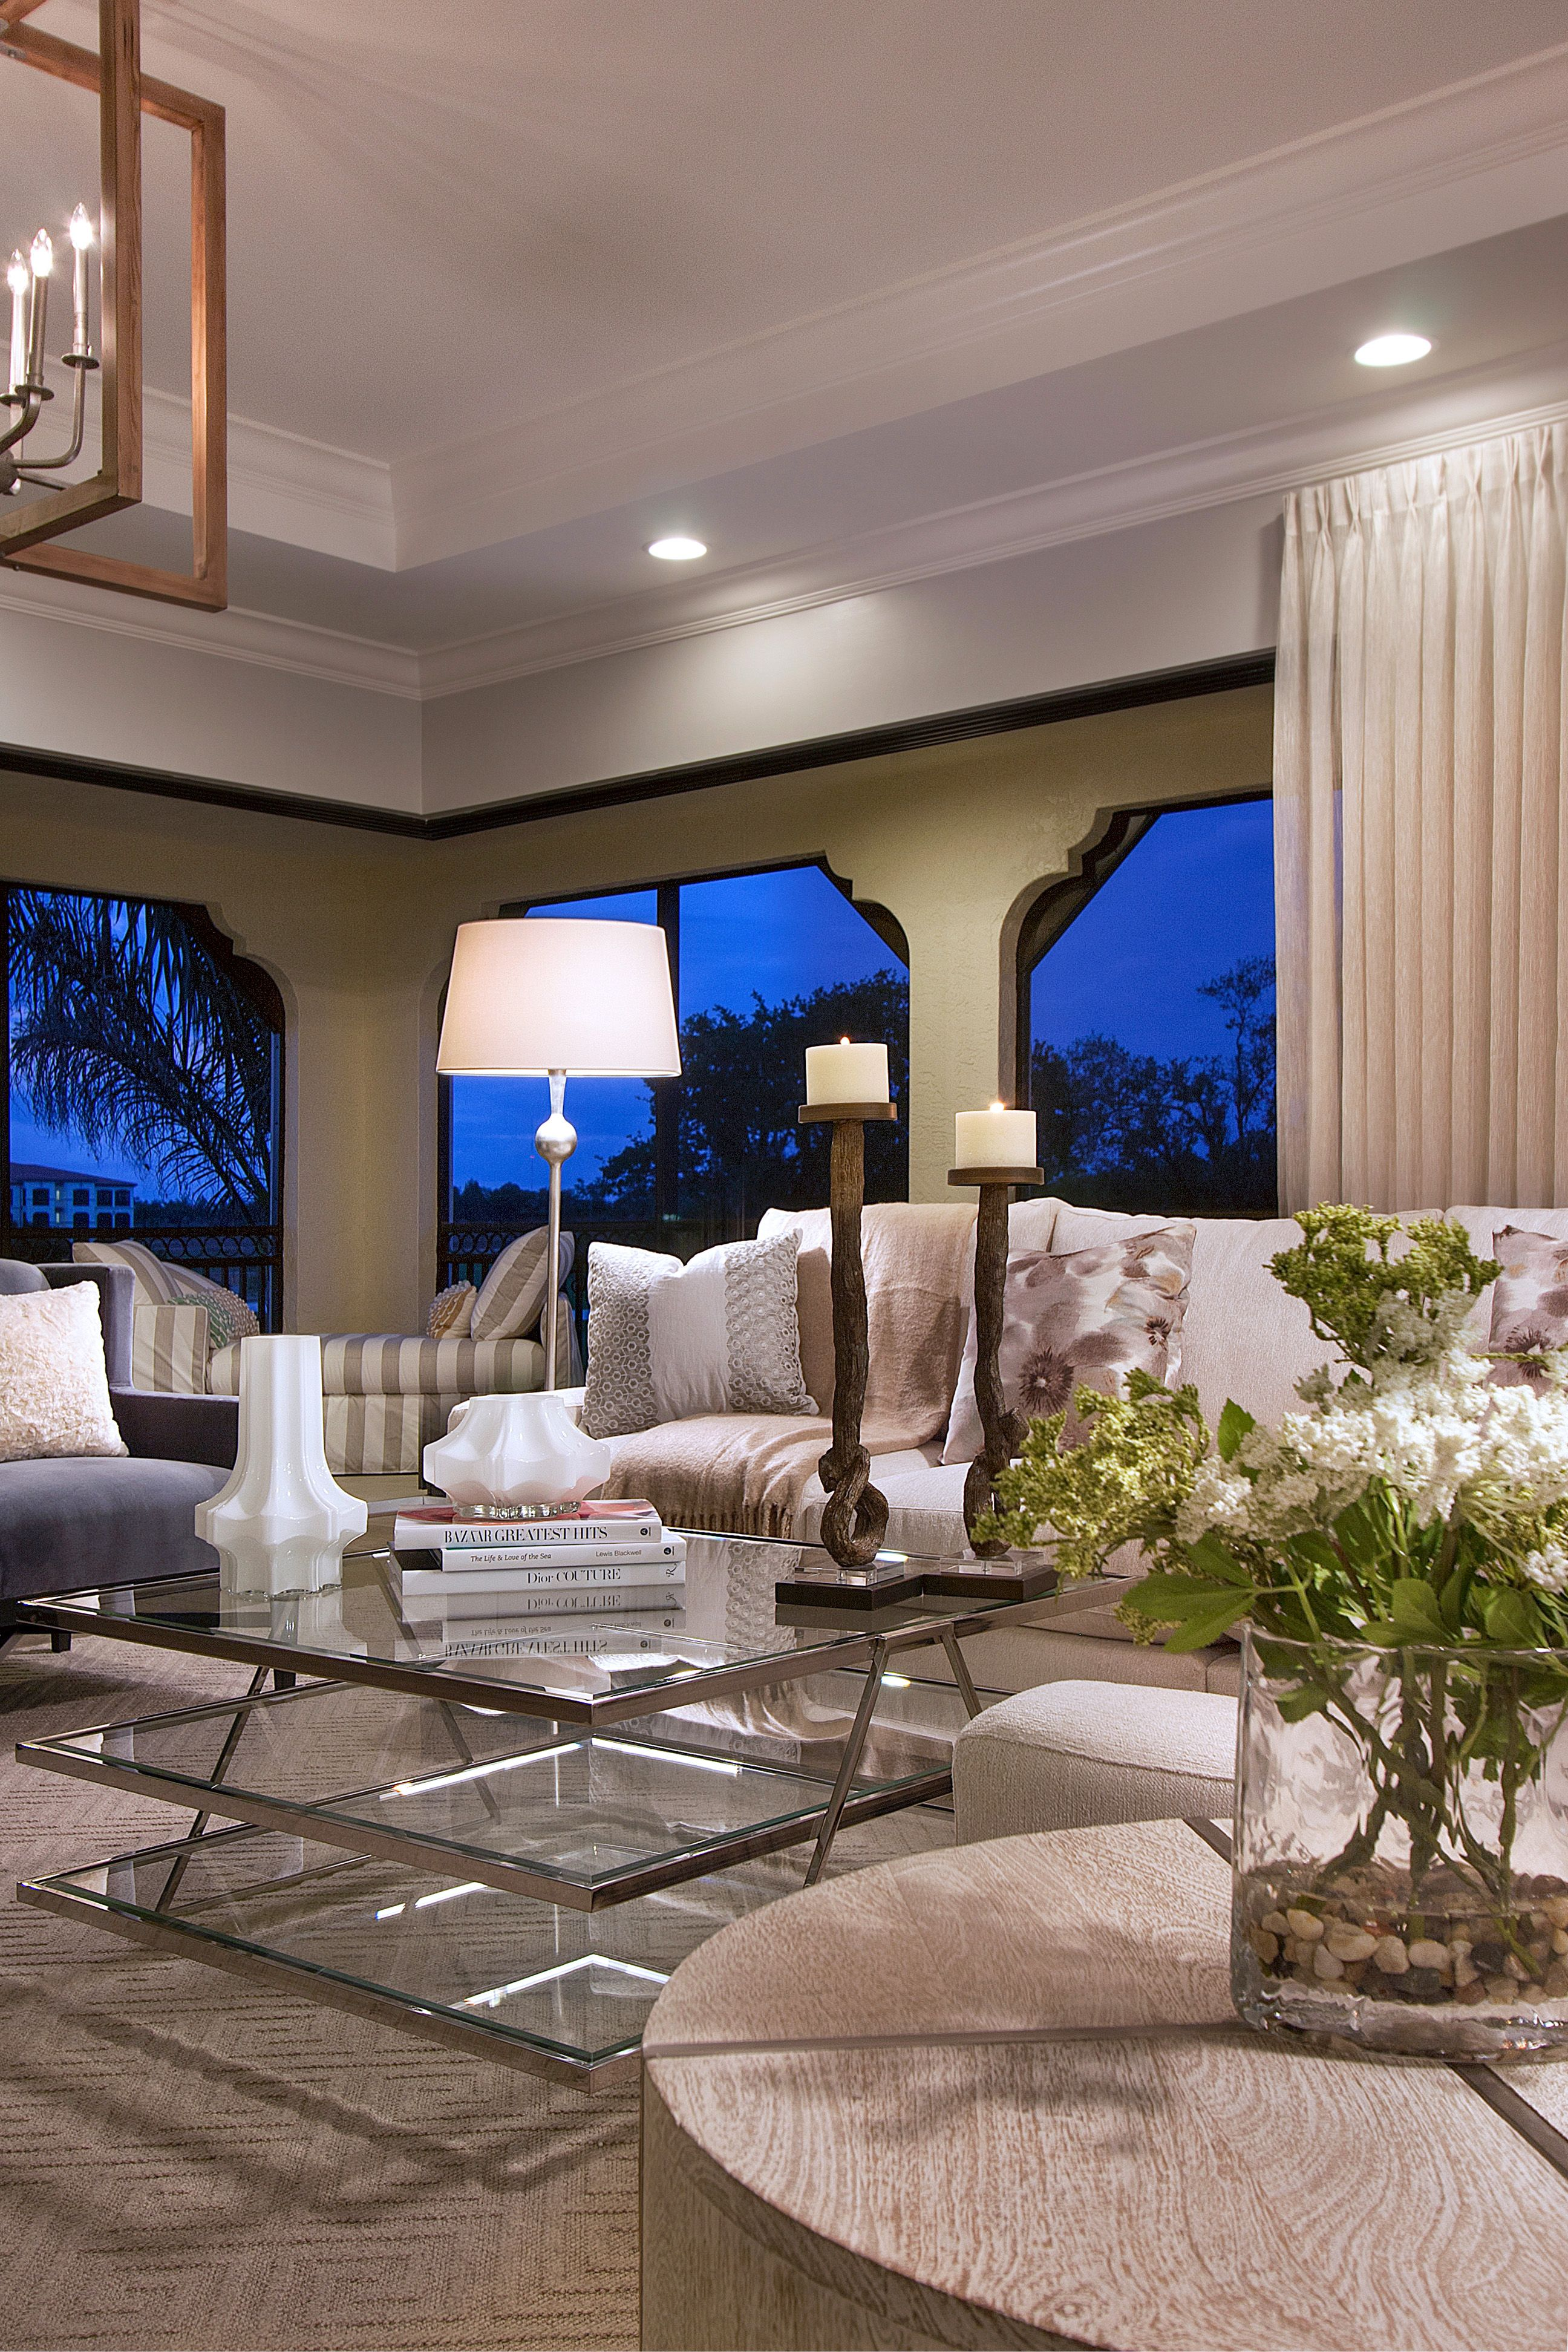 Luxury Home Designs By Bhid Decor Design Homedesign Designers Florida Naples Interior Interio Luxury House Designs Winter Interior Design House Design